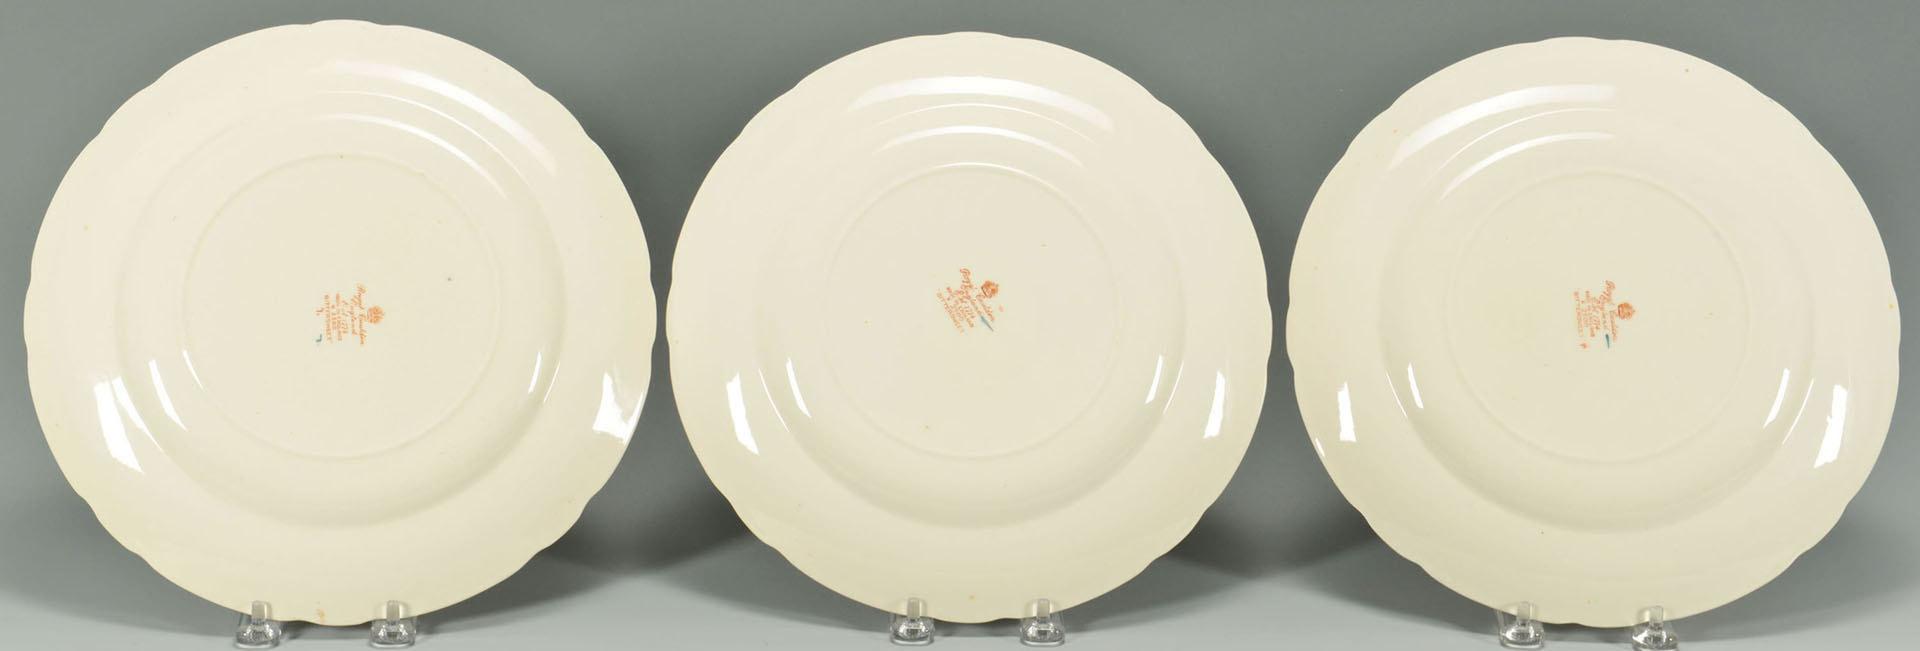 Lot 577: 6 English Royal Cauldon Porcelain Plates, Bittersw